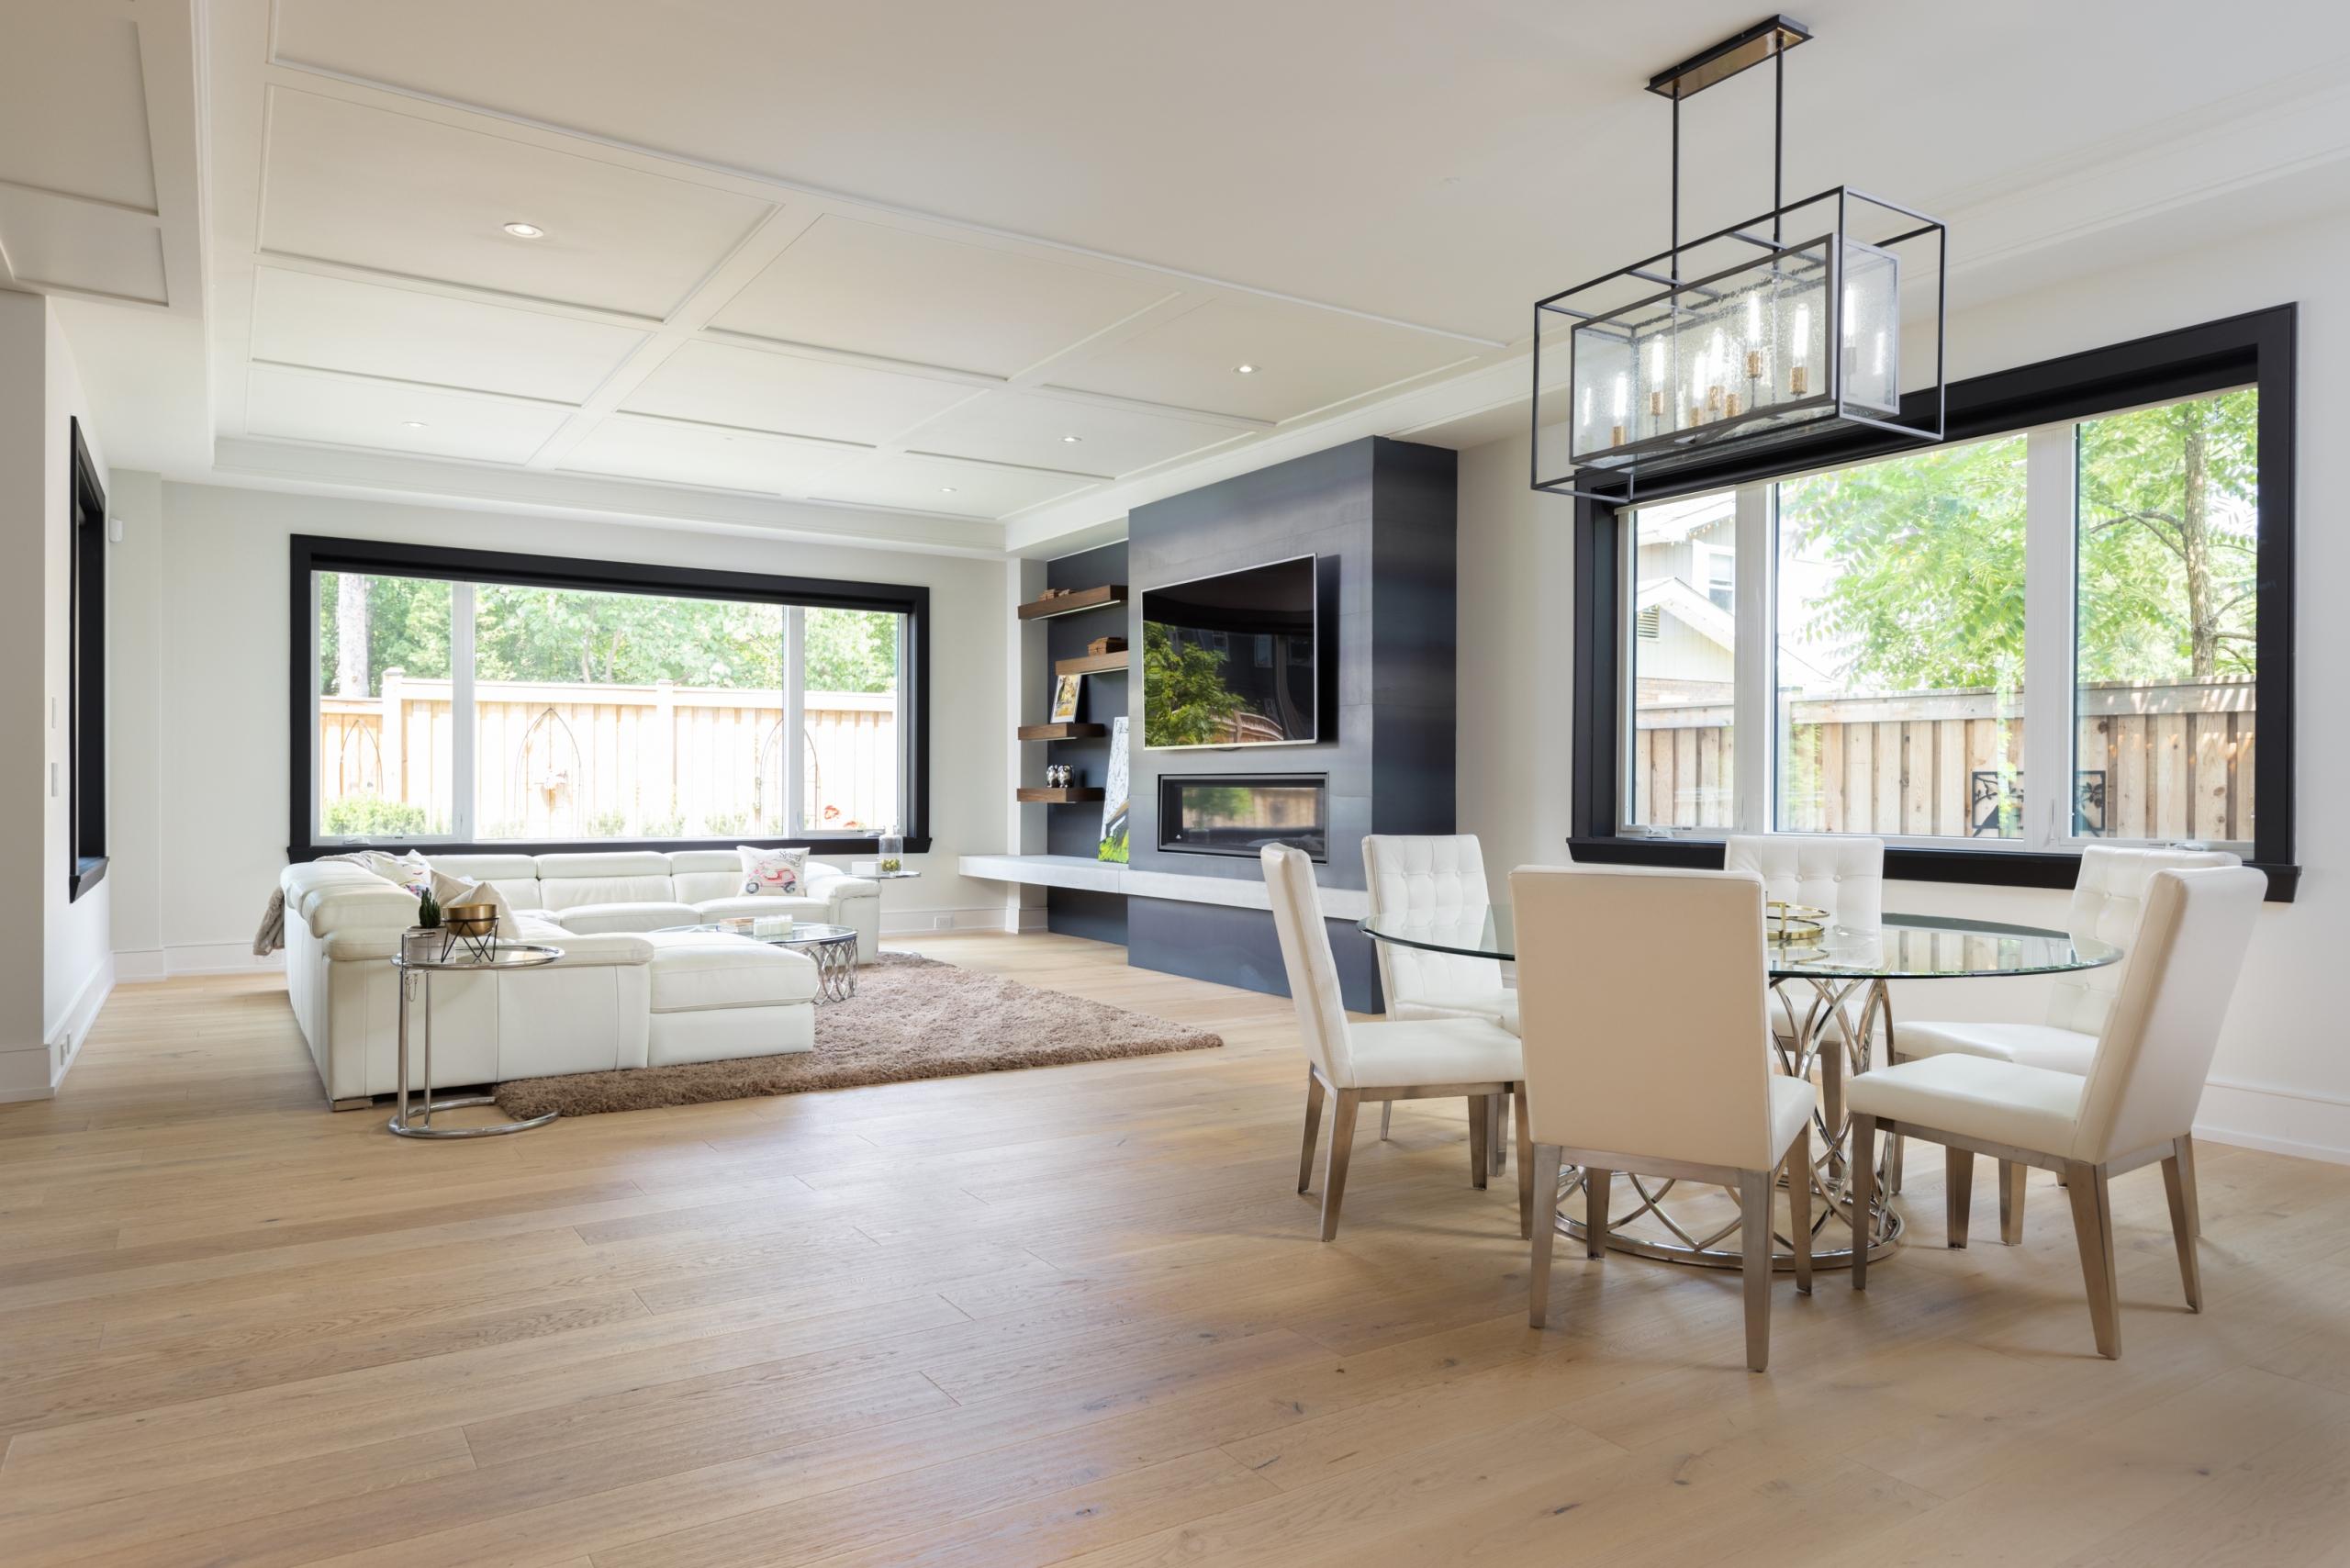 Dining room featured at 489 Lakeshore Road W, Oakville at Alex Irish & Associates